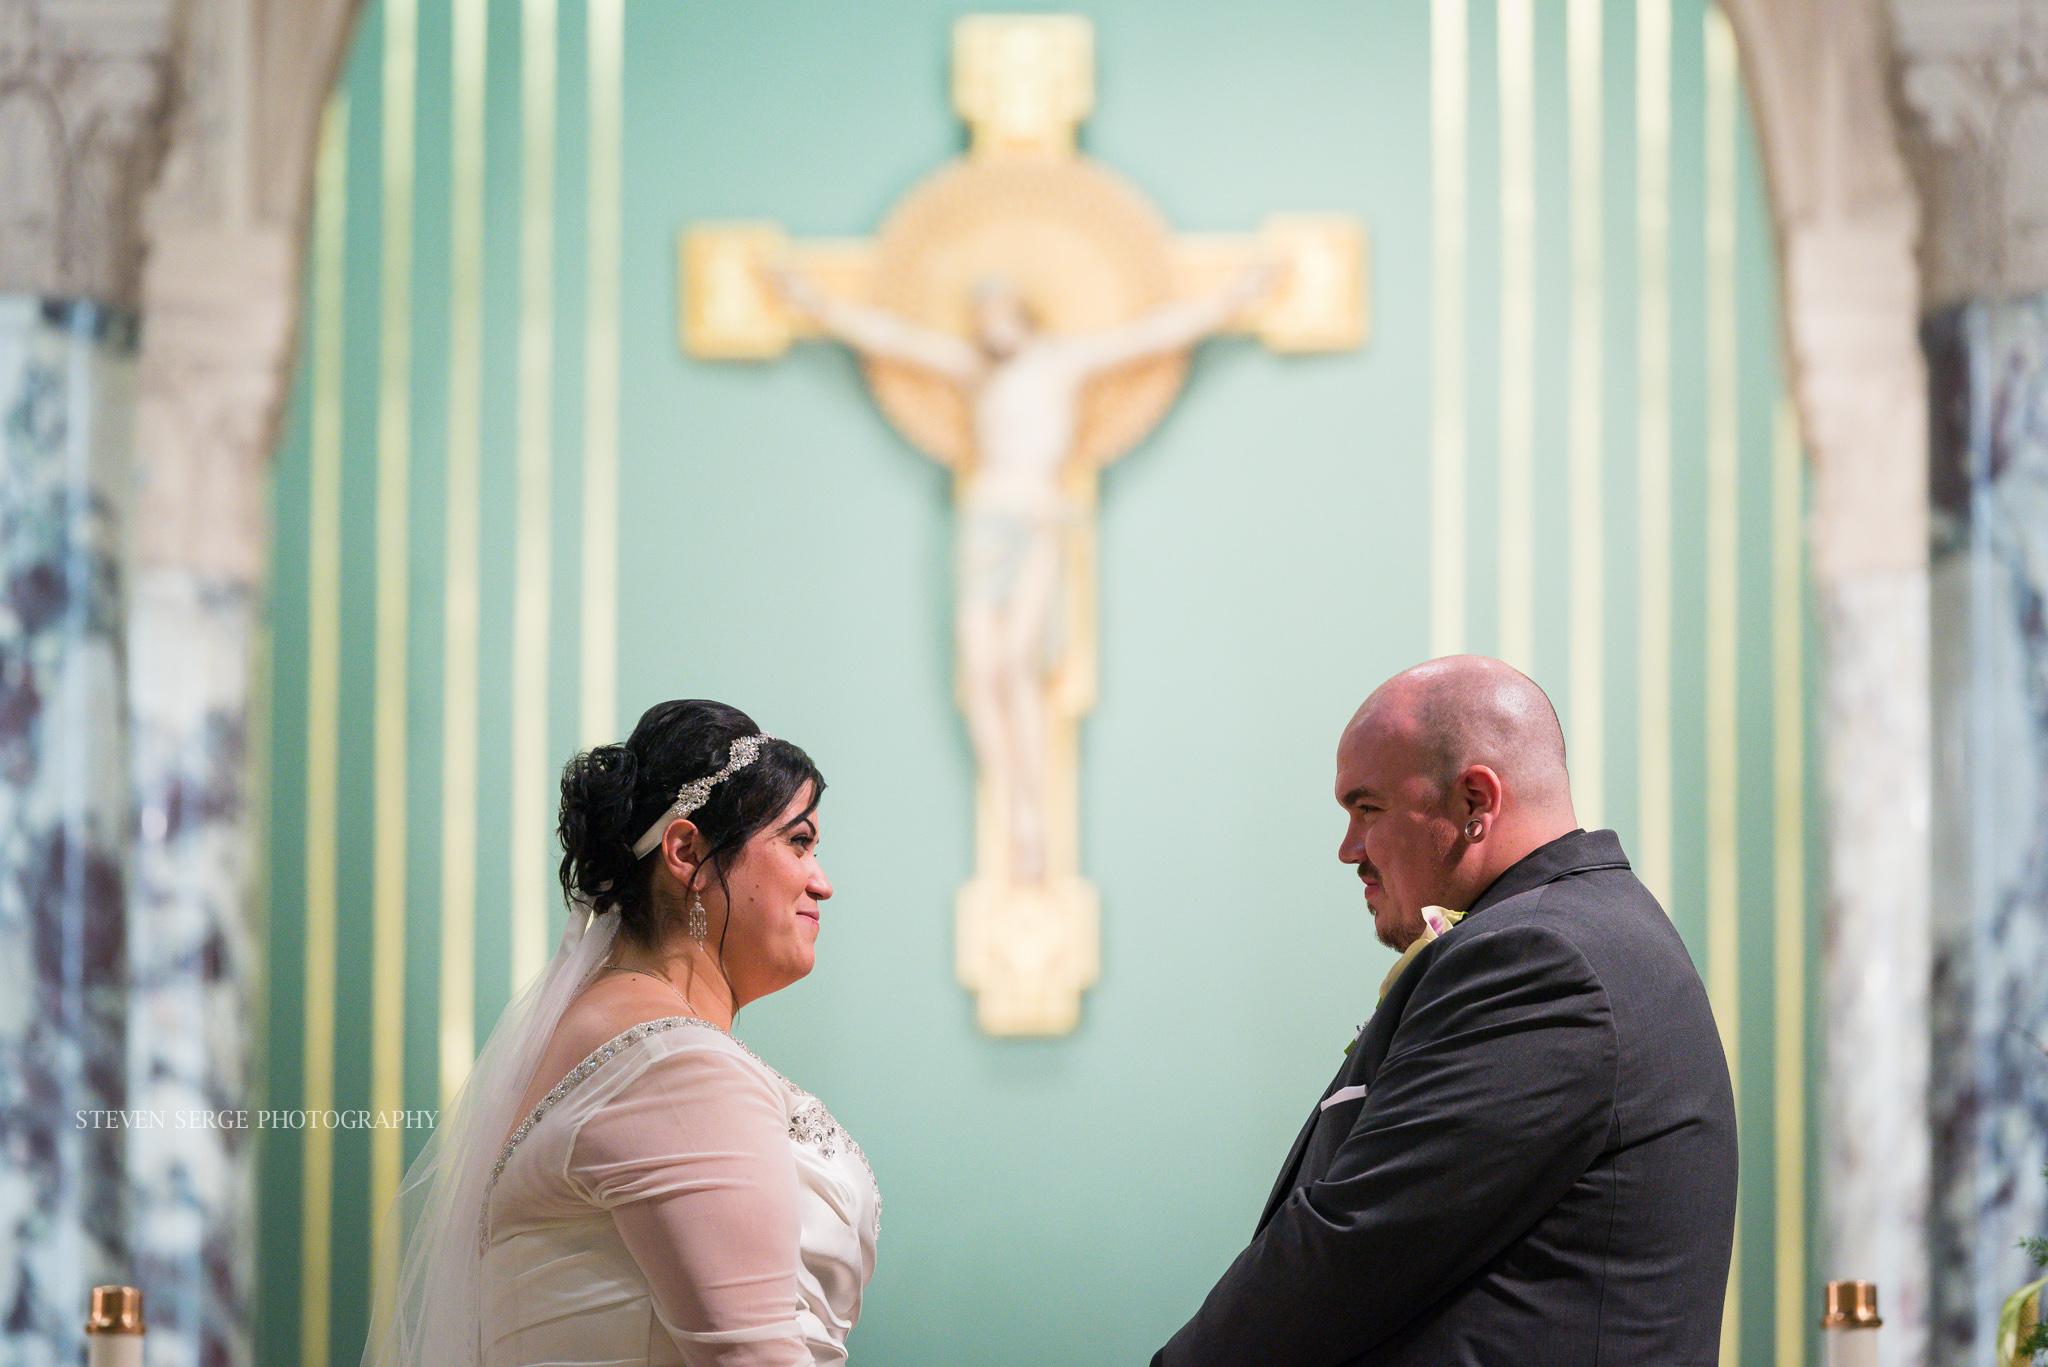 Scranton-wedding-photographer-fiorellis-steven-serge-15.jpg